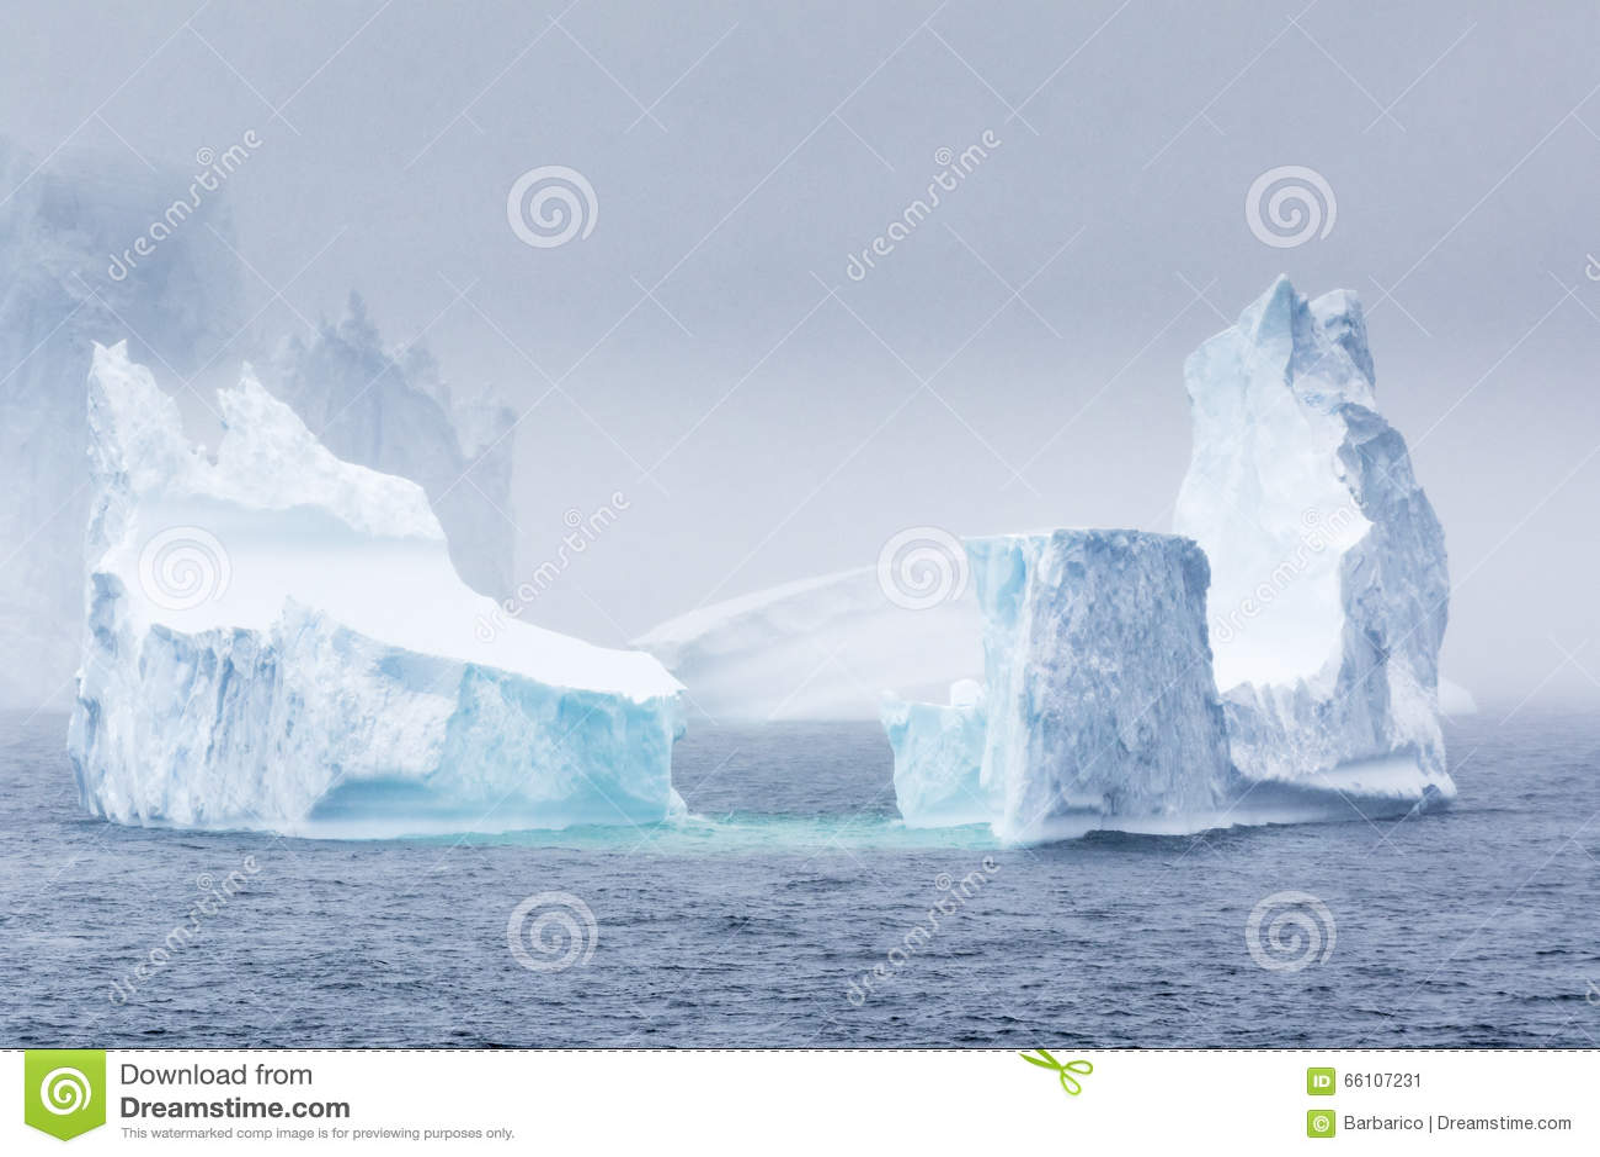 Антартический айсберг